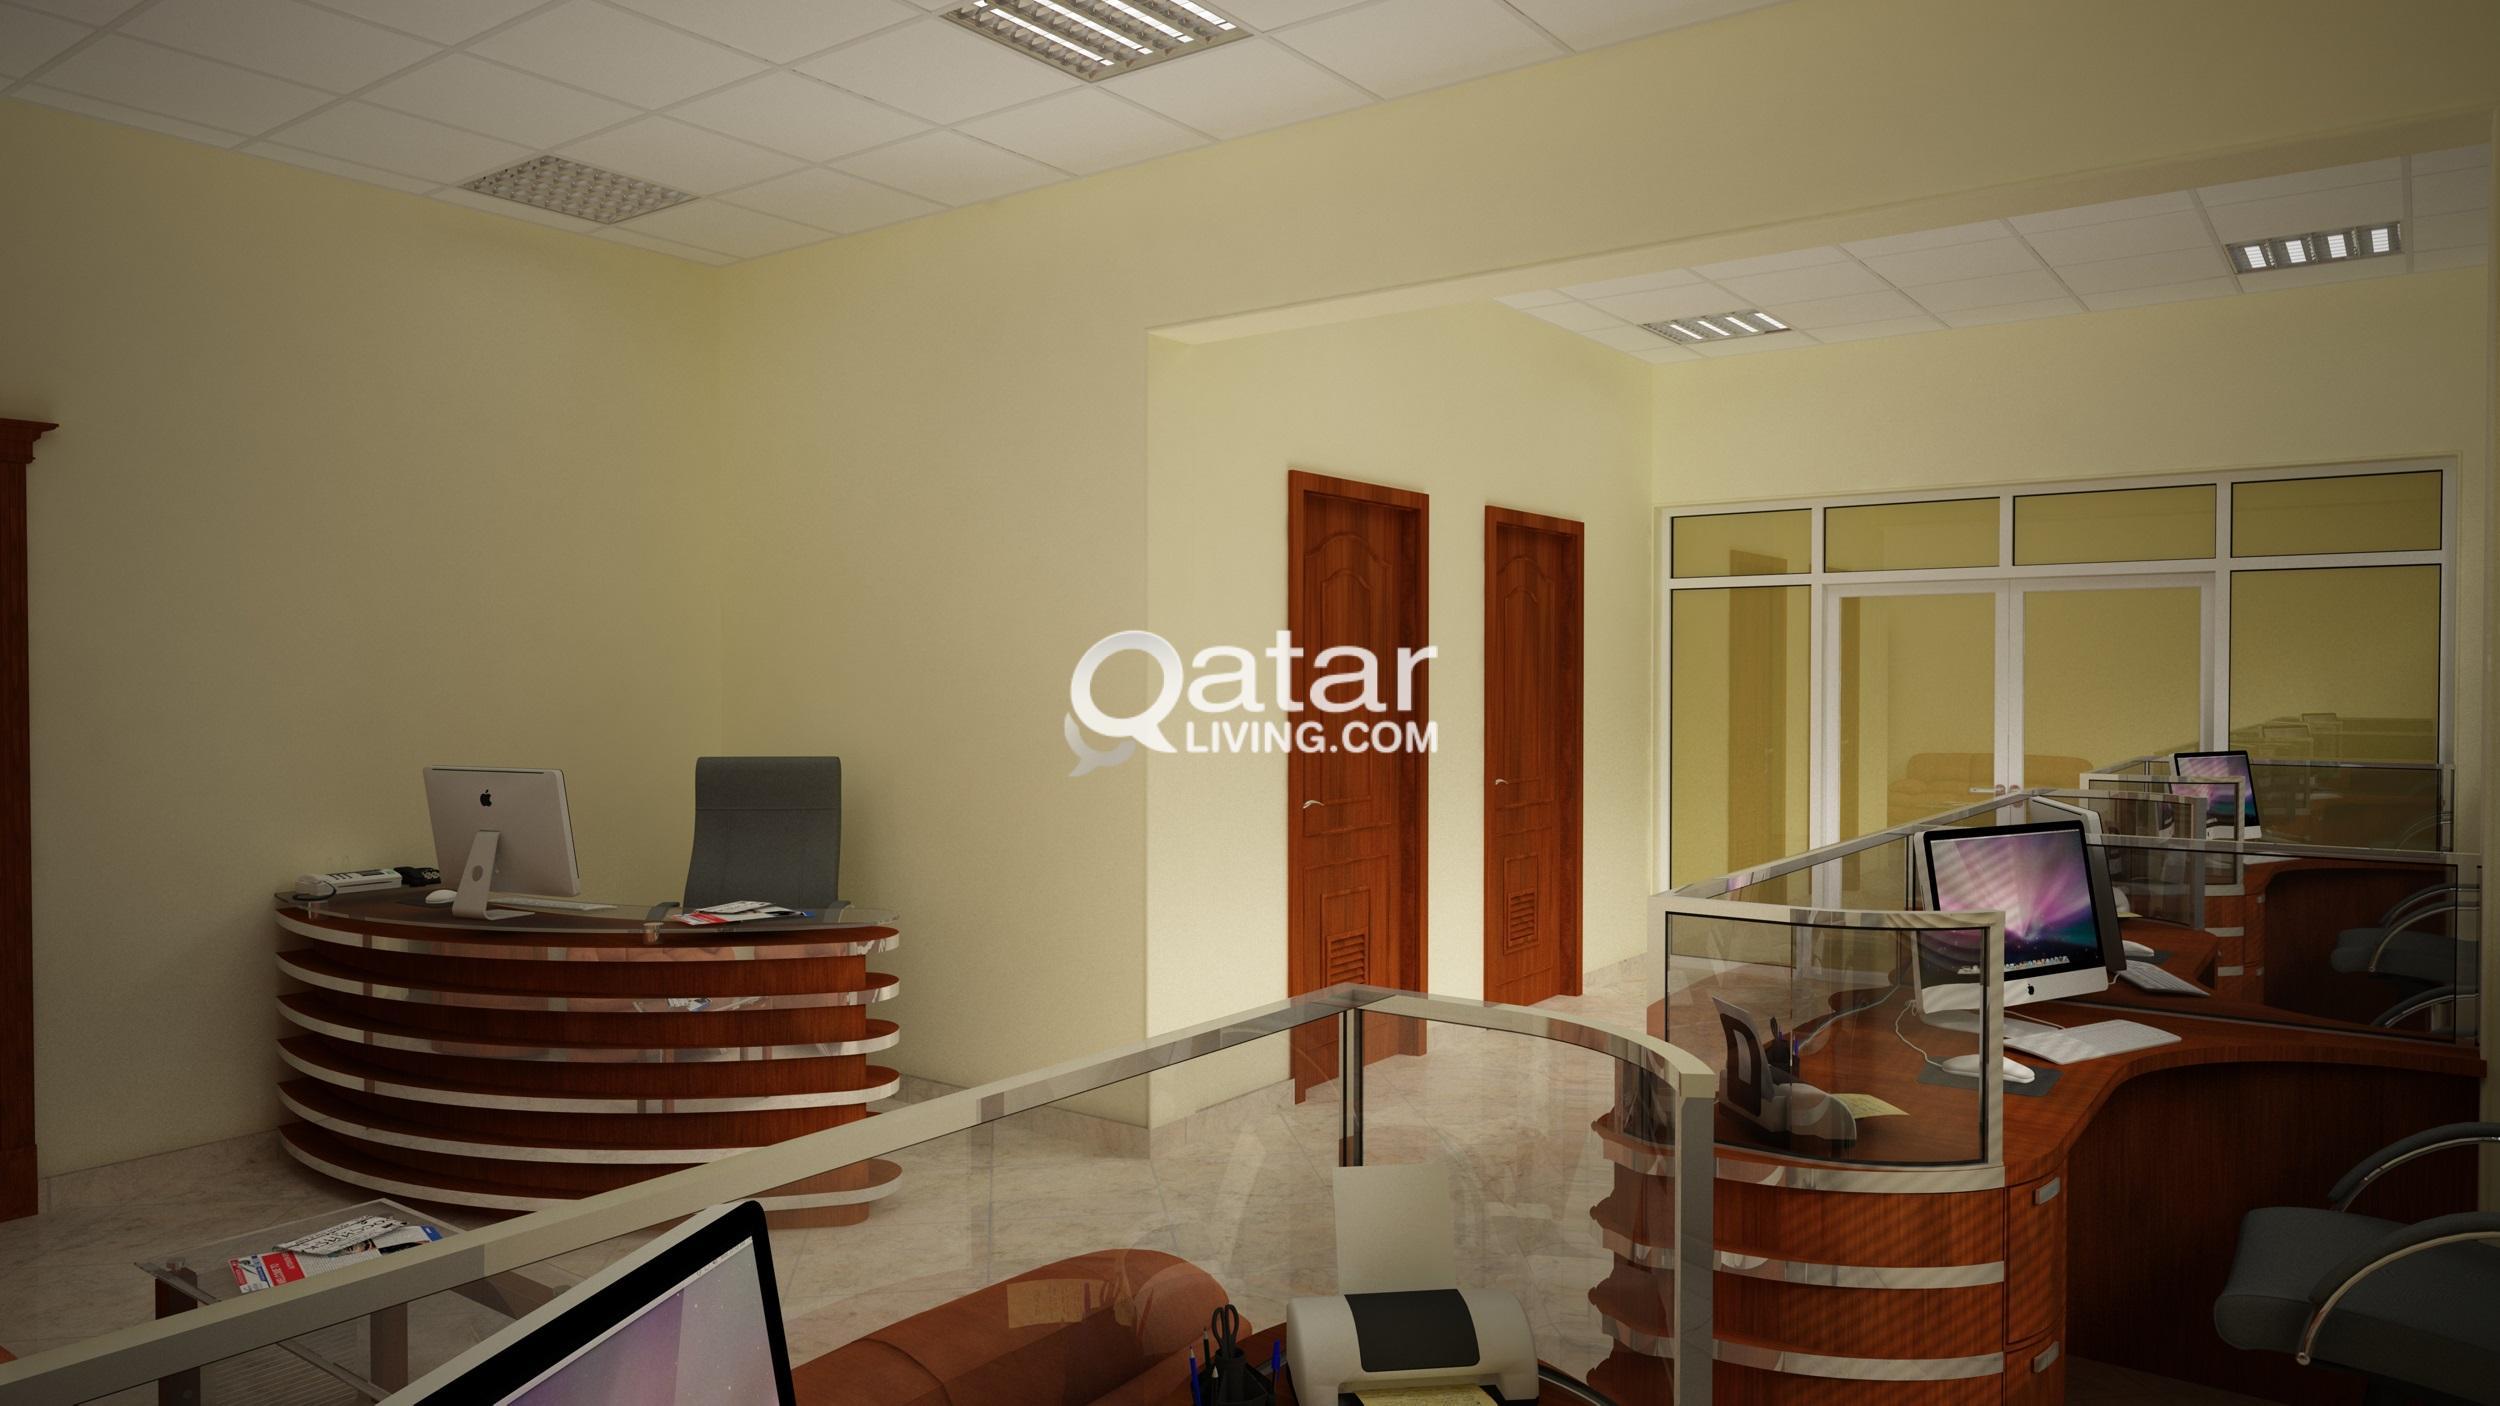 3d Visualizer Interior Exterior Looking For A Job Qatar